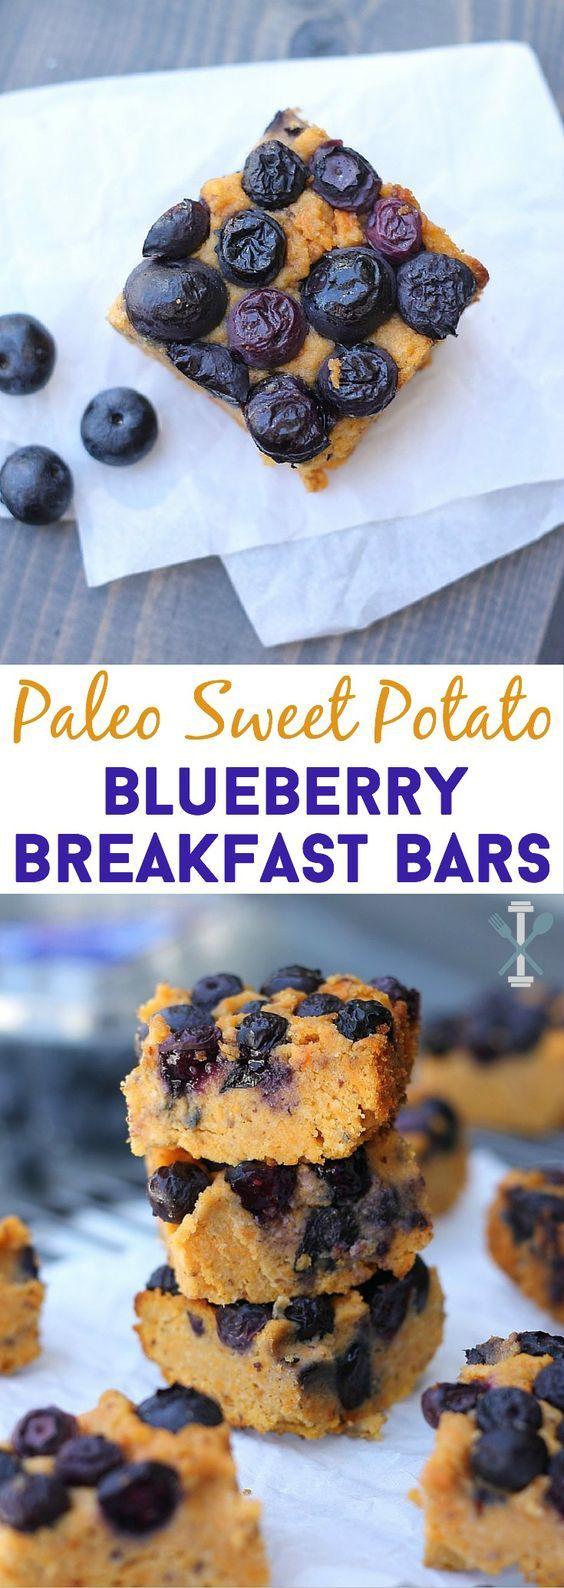 how to make healthy breakfast bars